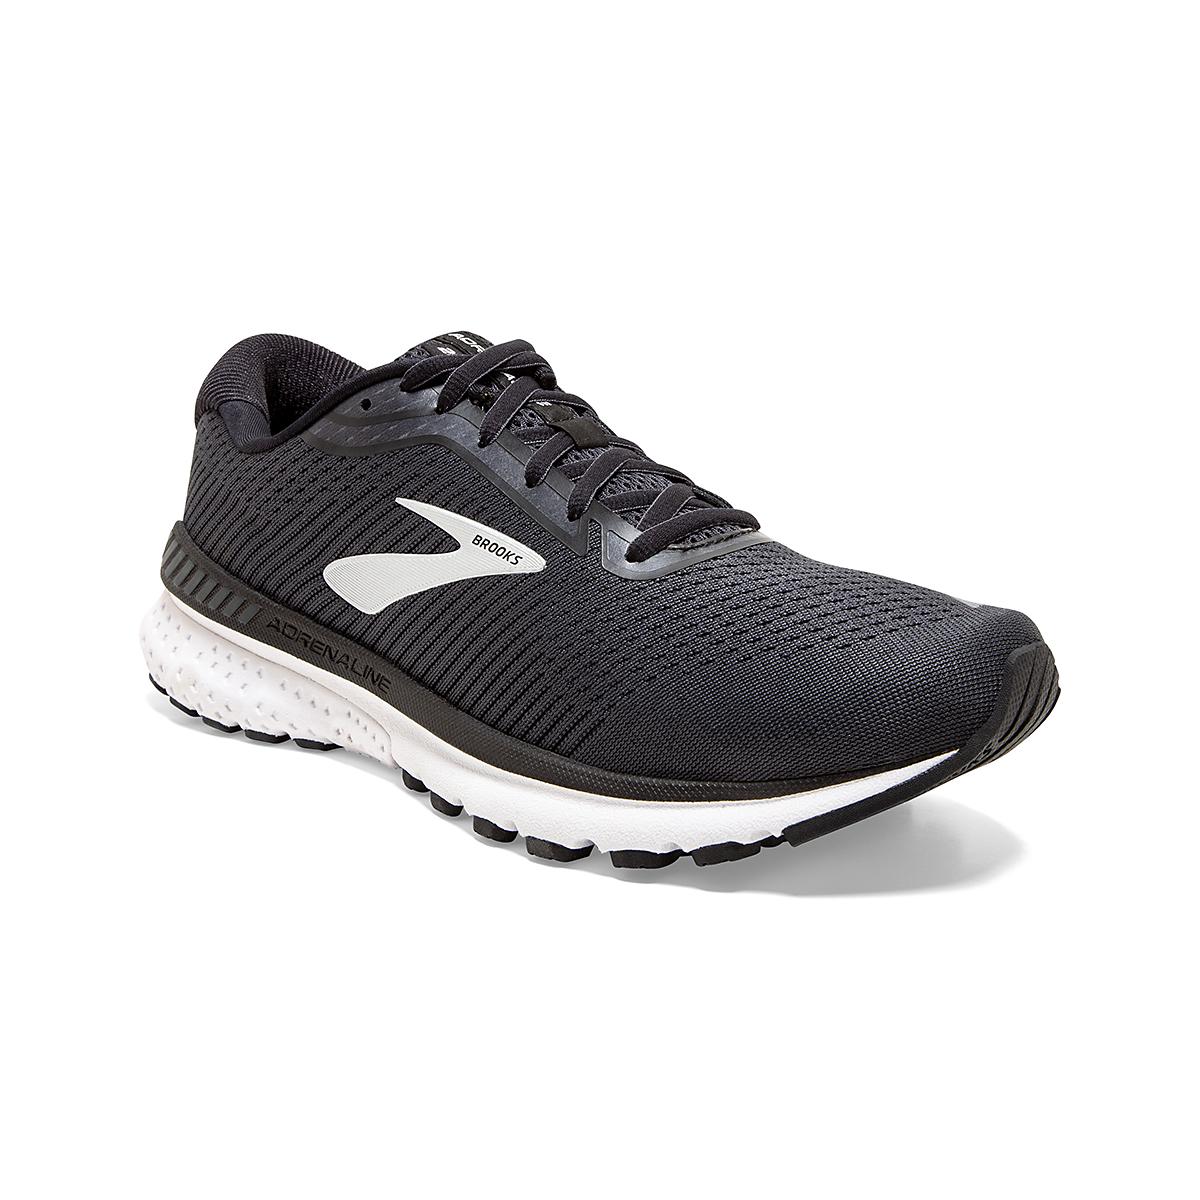 Men's Brooks Adrenaline GTS 20 Running Shoe - Color: Black/Grey/Ebony - Size: 7 - Width: Regular, Black/Grey/Ebony, large, image 3